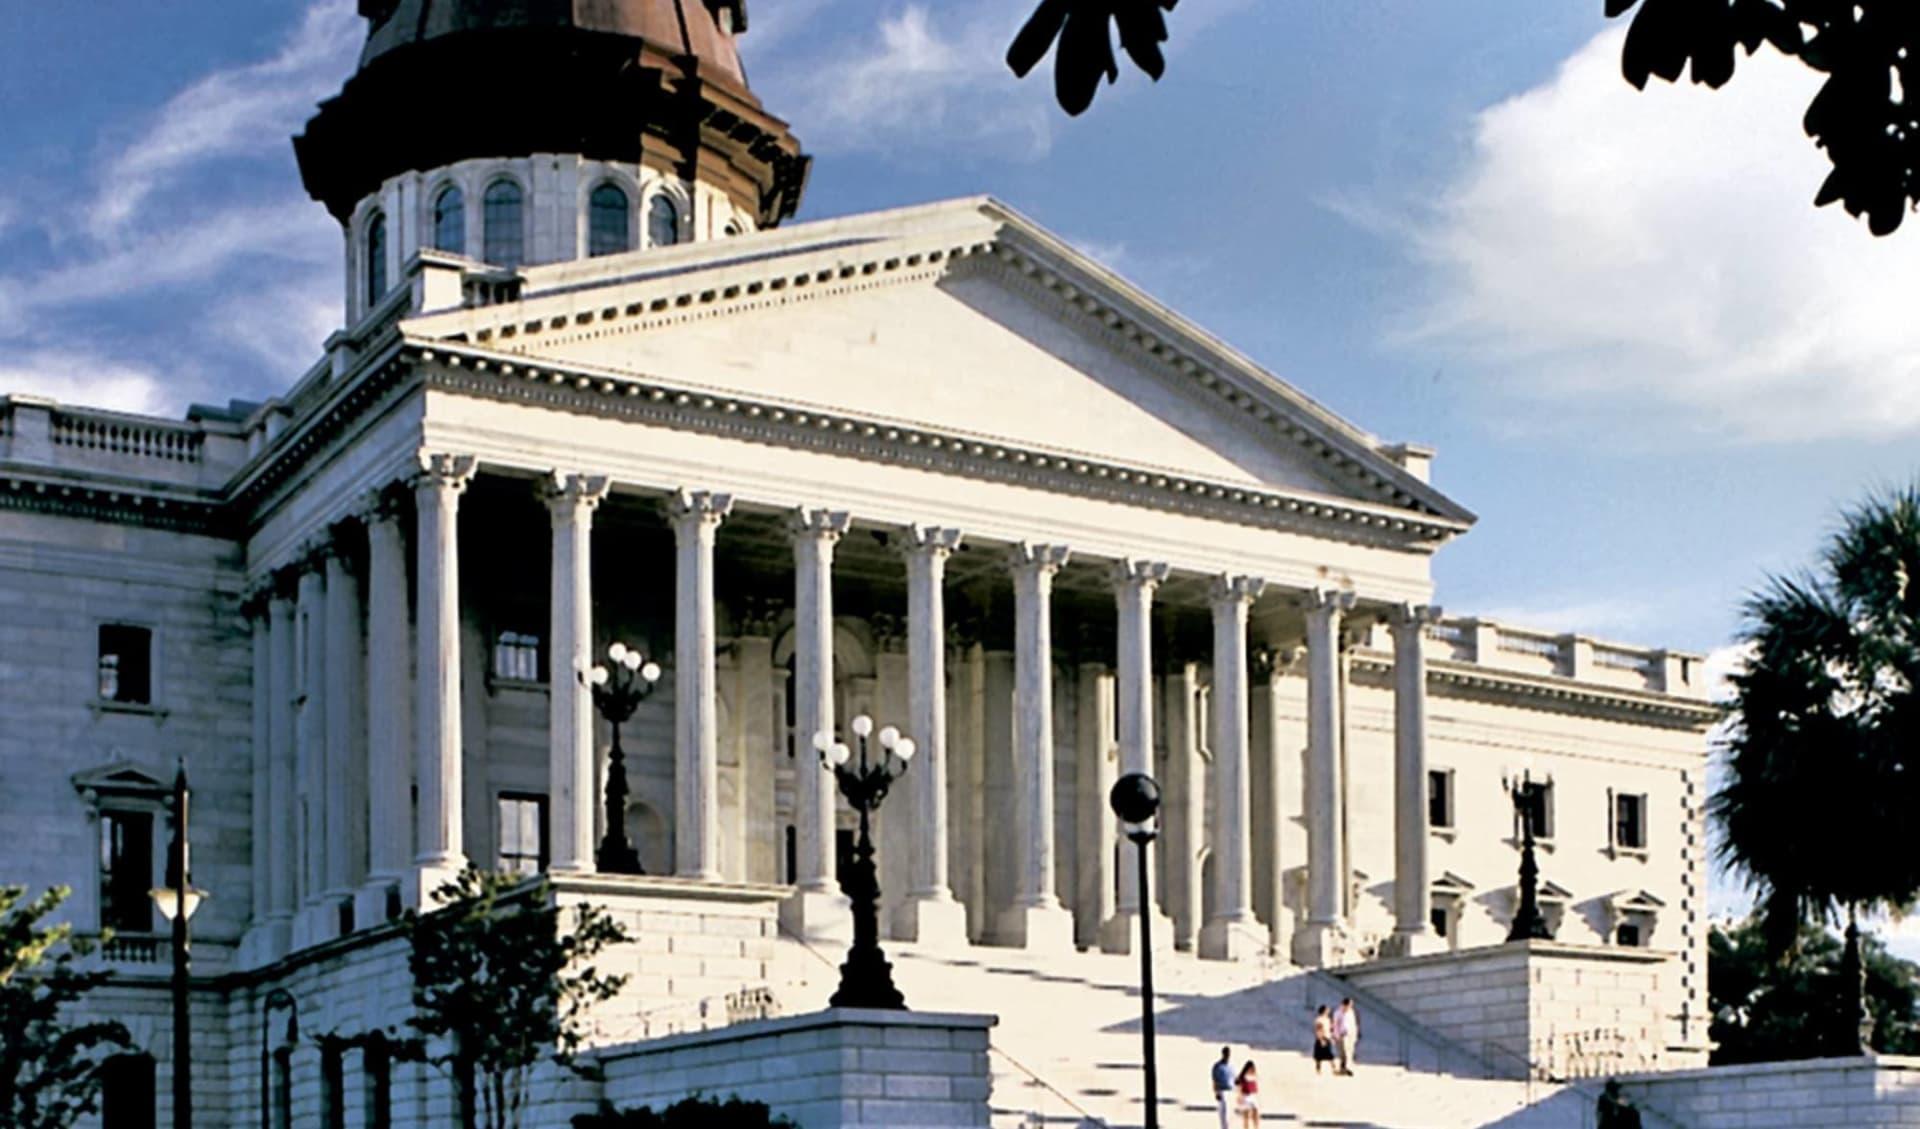 Beautiful North & South Carolina ab Charlotte: USA - South Carolina - State House, Columbia